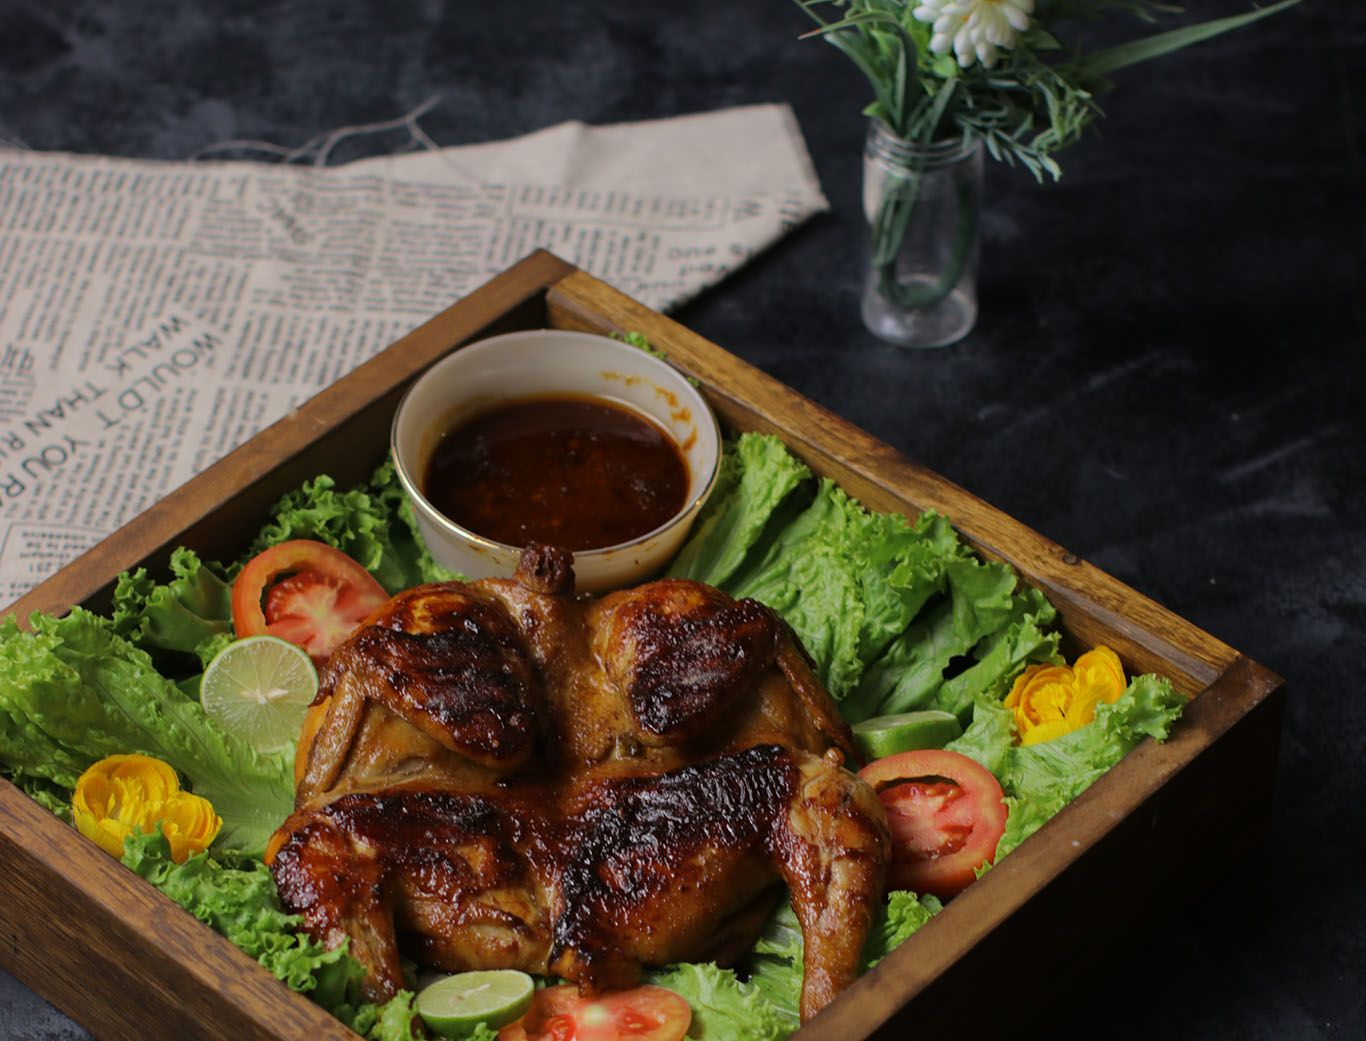 Resep Ayam Bakar Pedas Manis